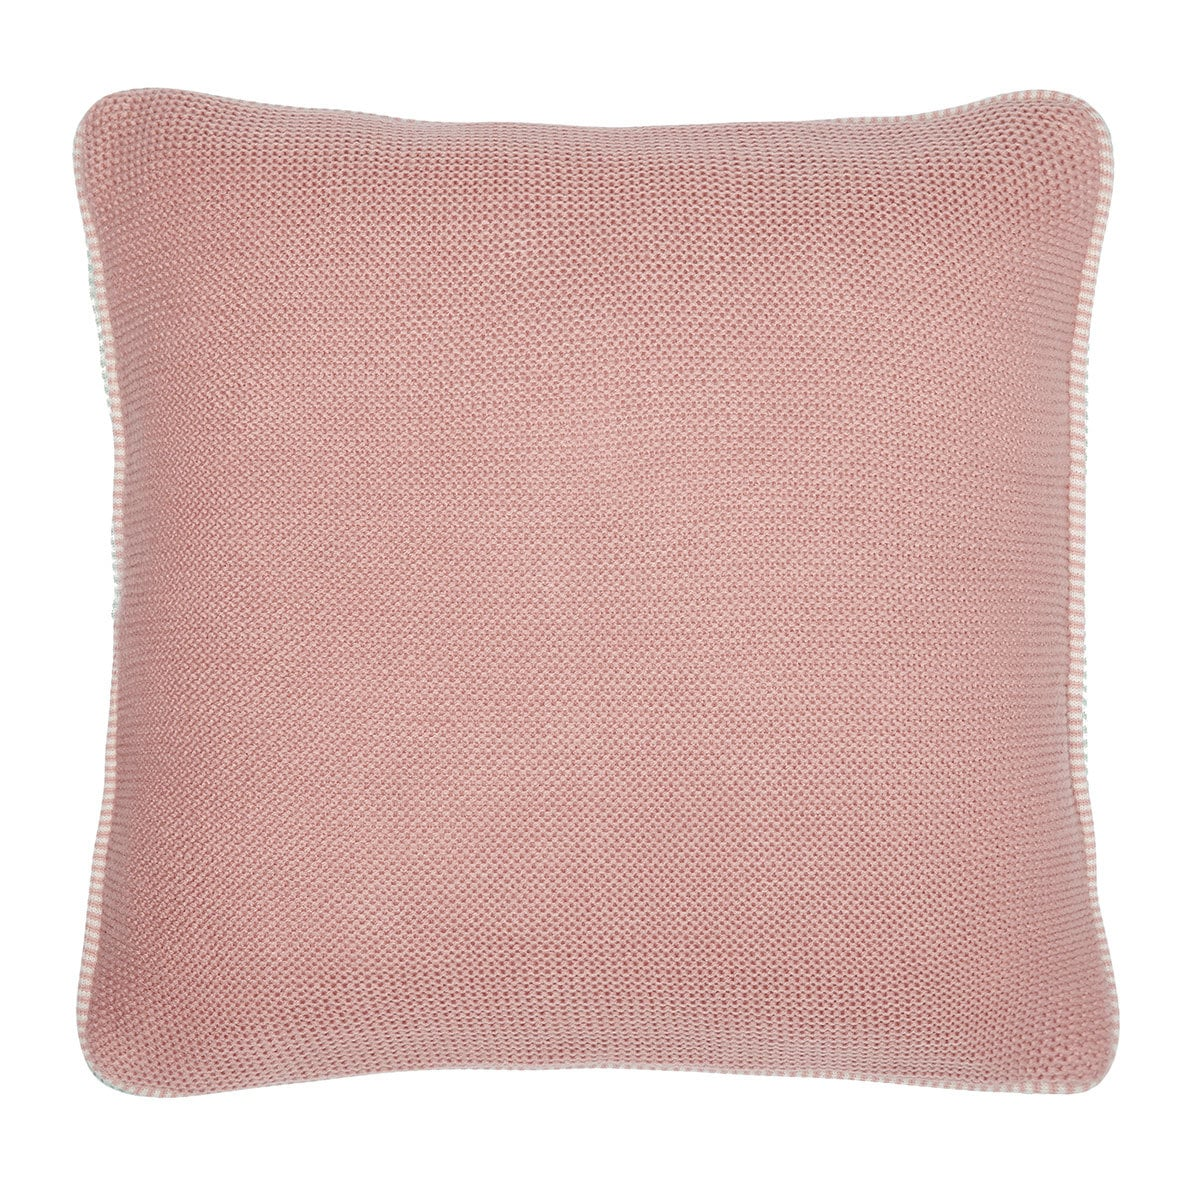 pip studio cosy tagesdecke oder dekokissen pink g nstig. Black Bedroom Furniture Sets. Home Design Ideas